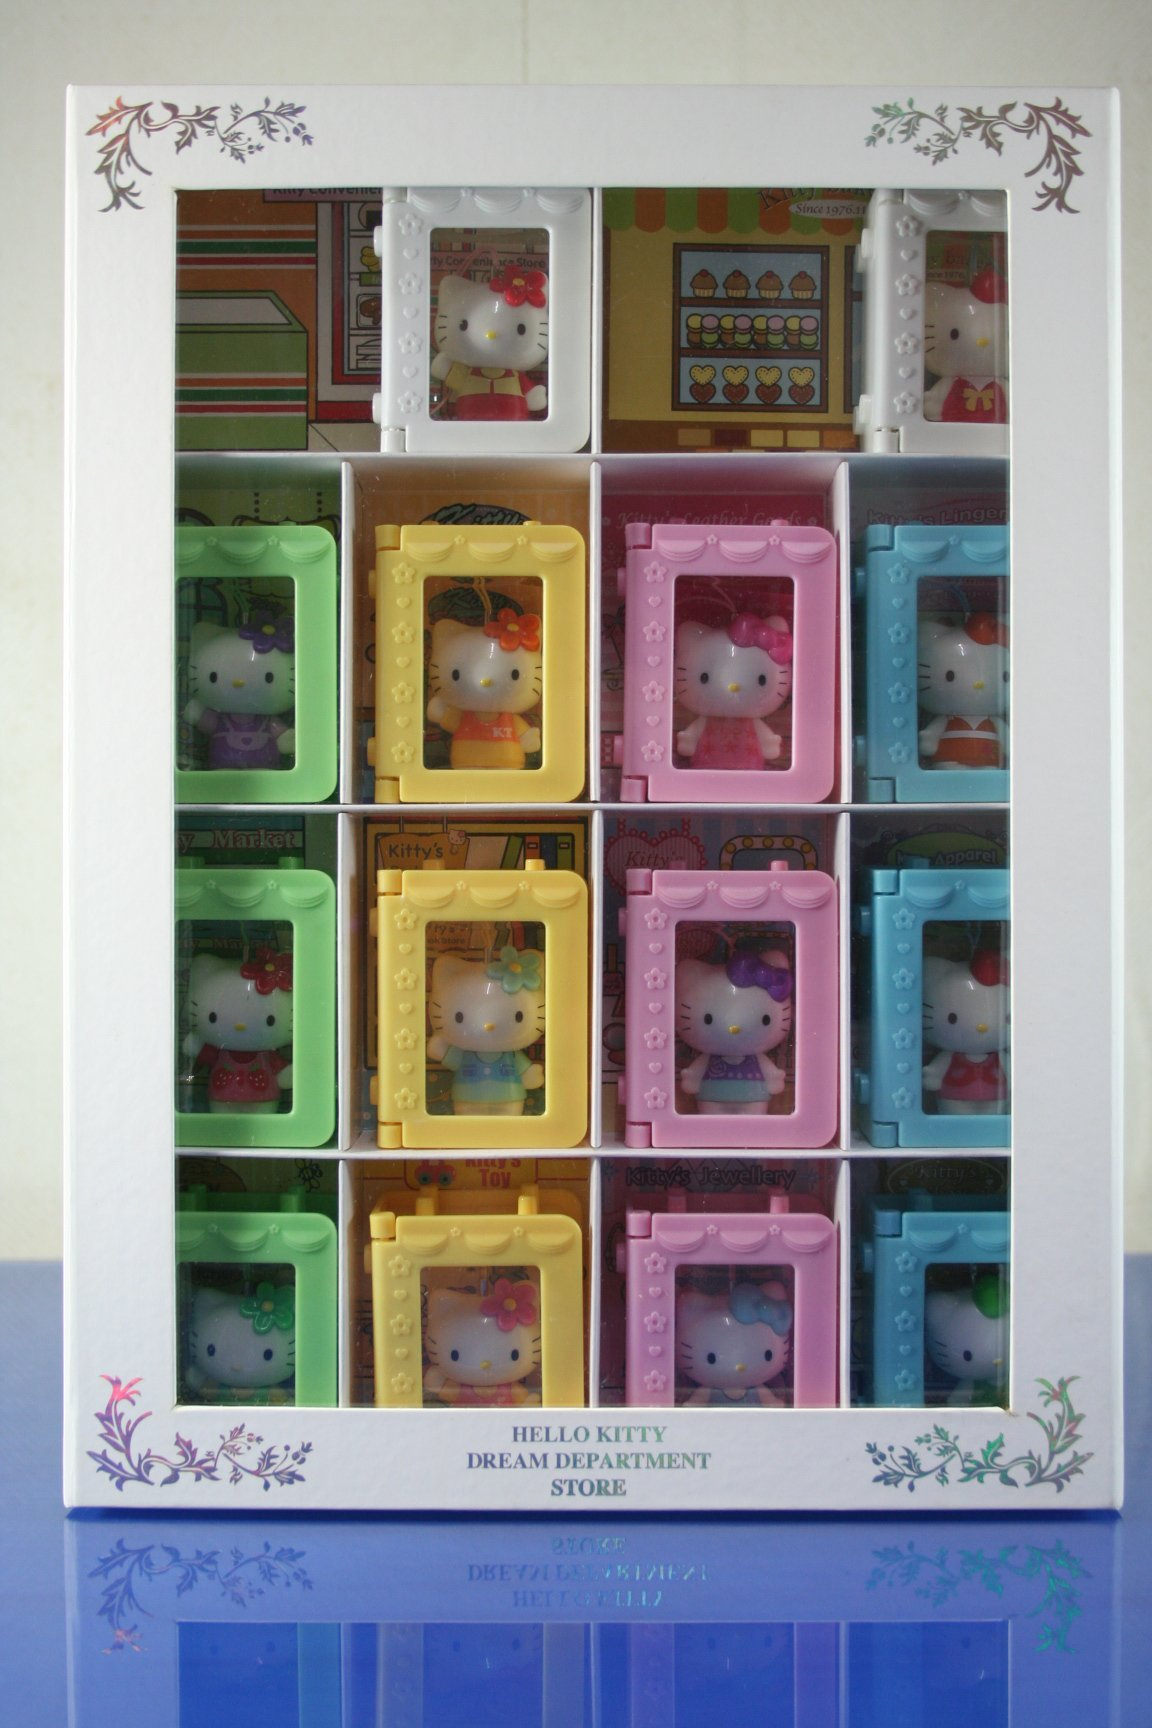 //Dream 翔// 現貨 全新已拆 7-11 Hello Kitty 夢幻百貨系列公仔 12+2款 一套